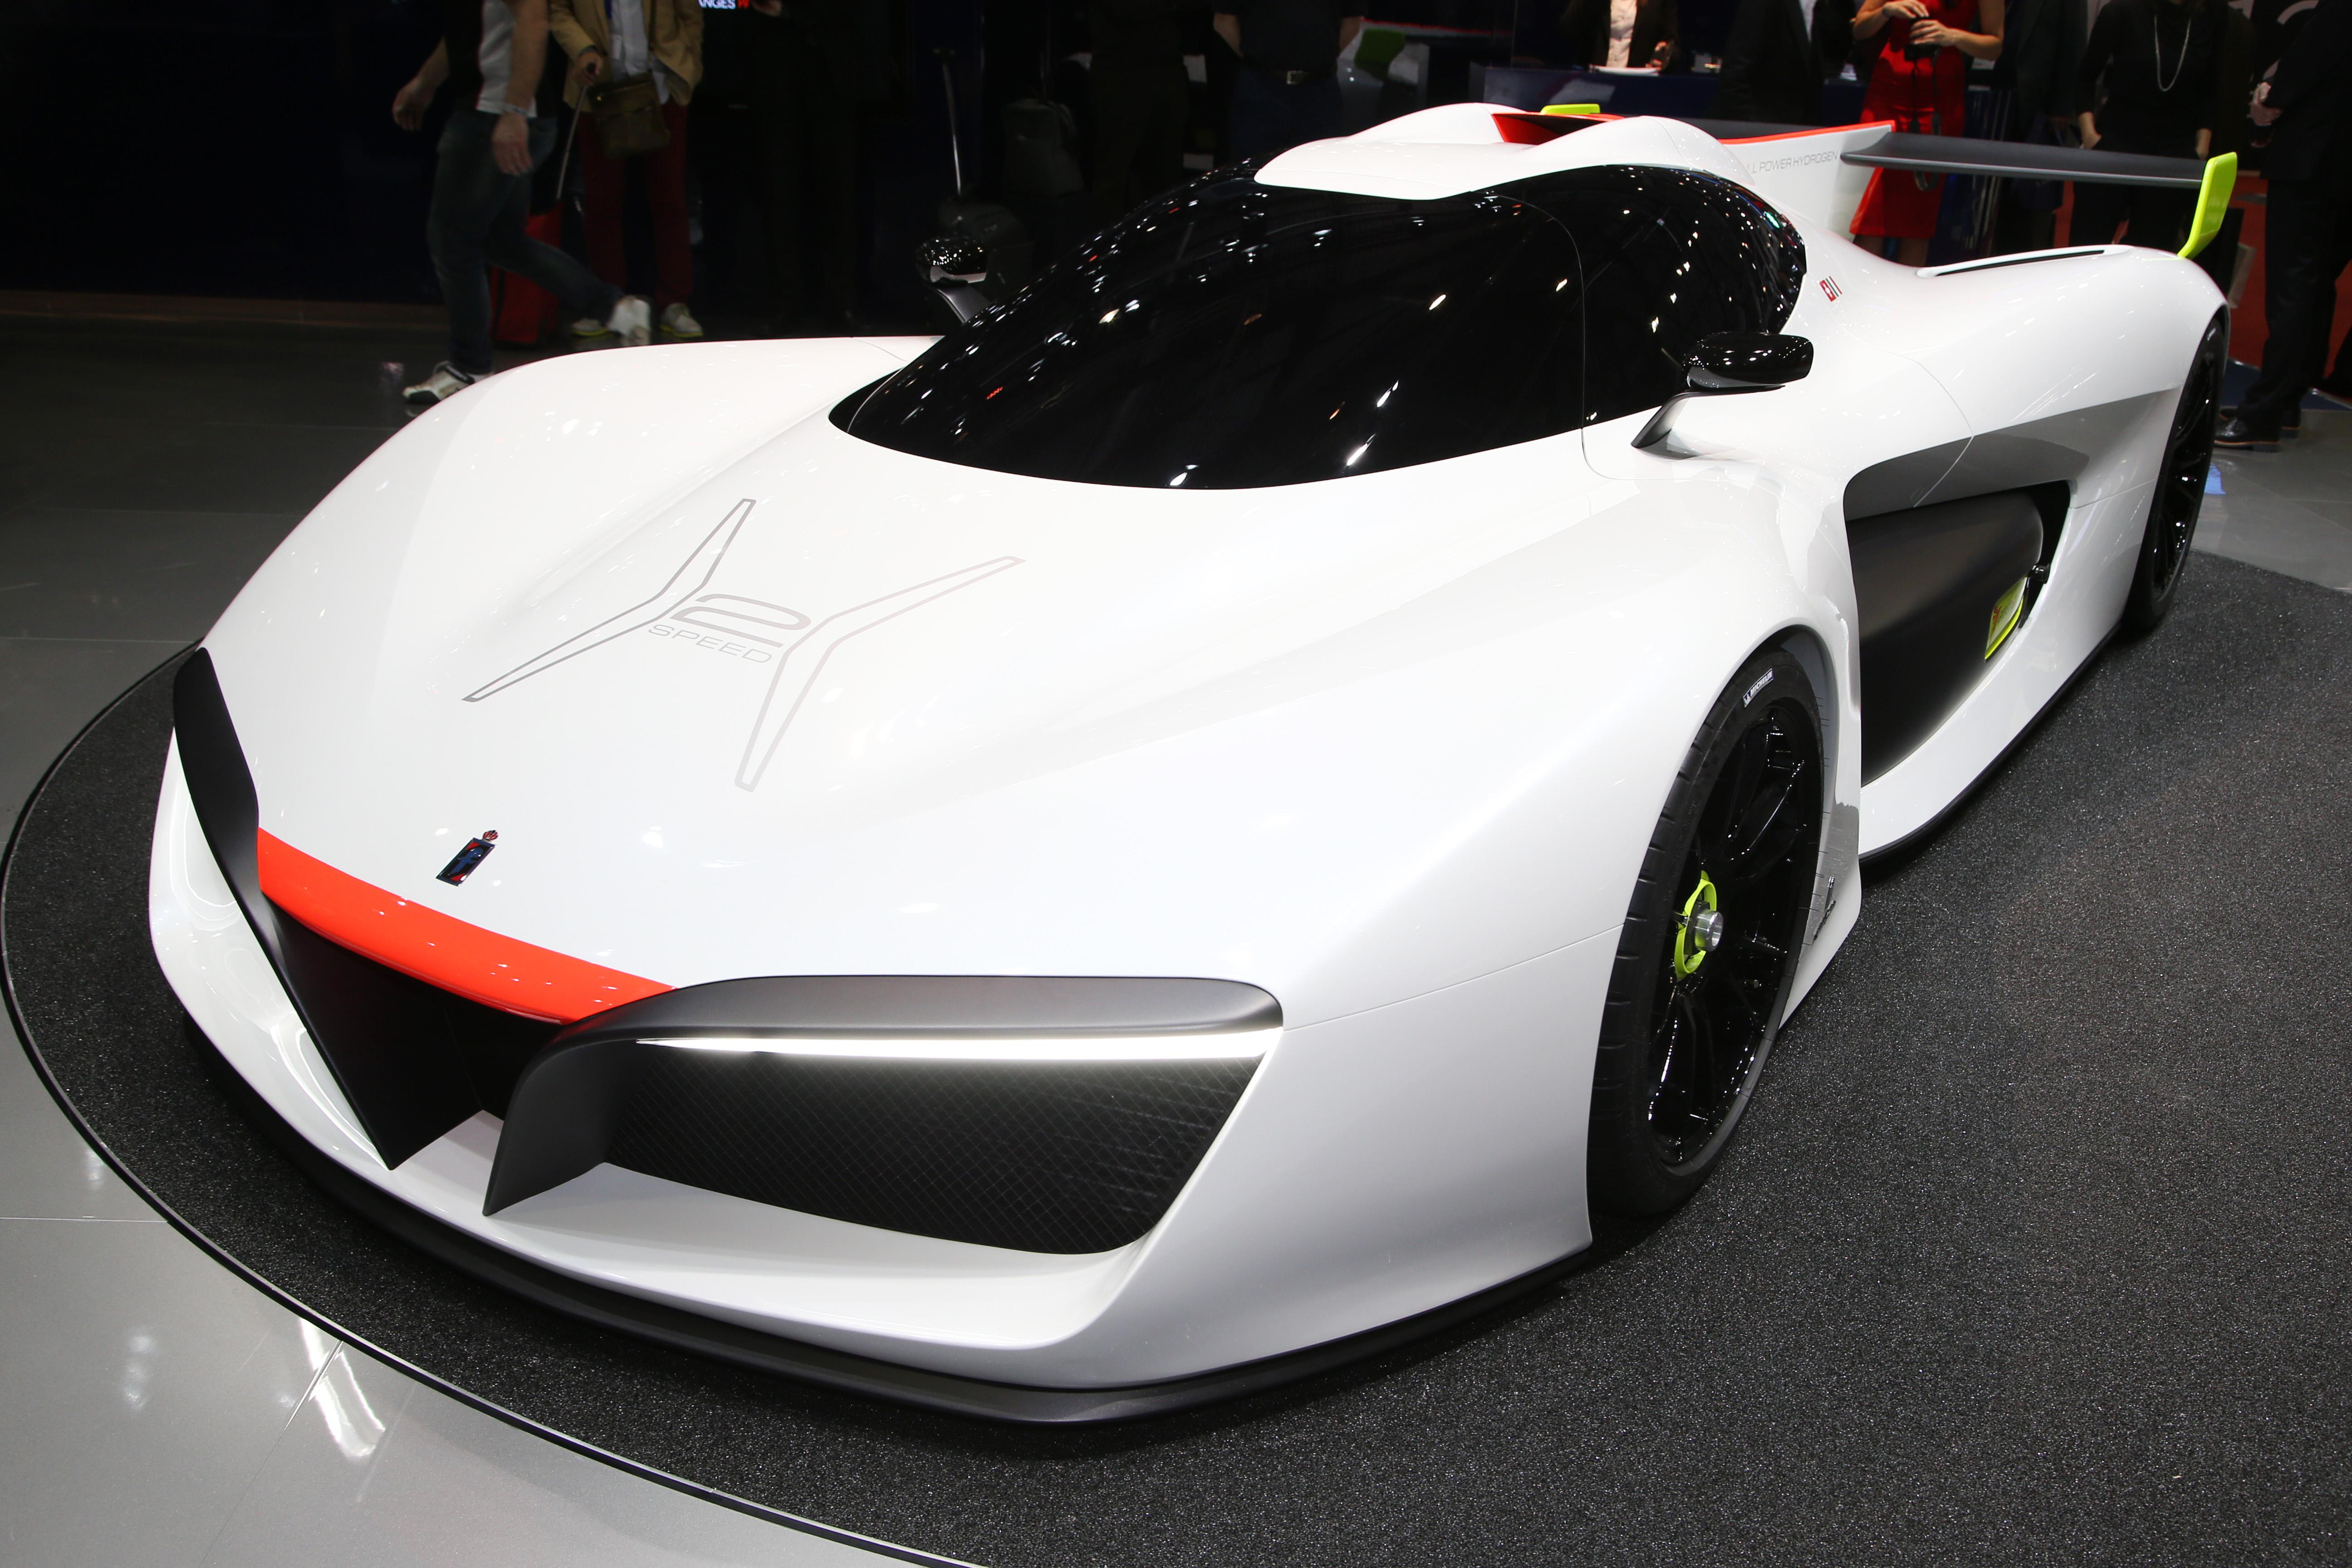 Pininfarina H2 Speed Concept: Pininfarina H2 Speed Concept, A Hydrogen Supercar Image 453155